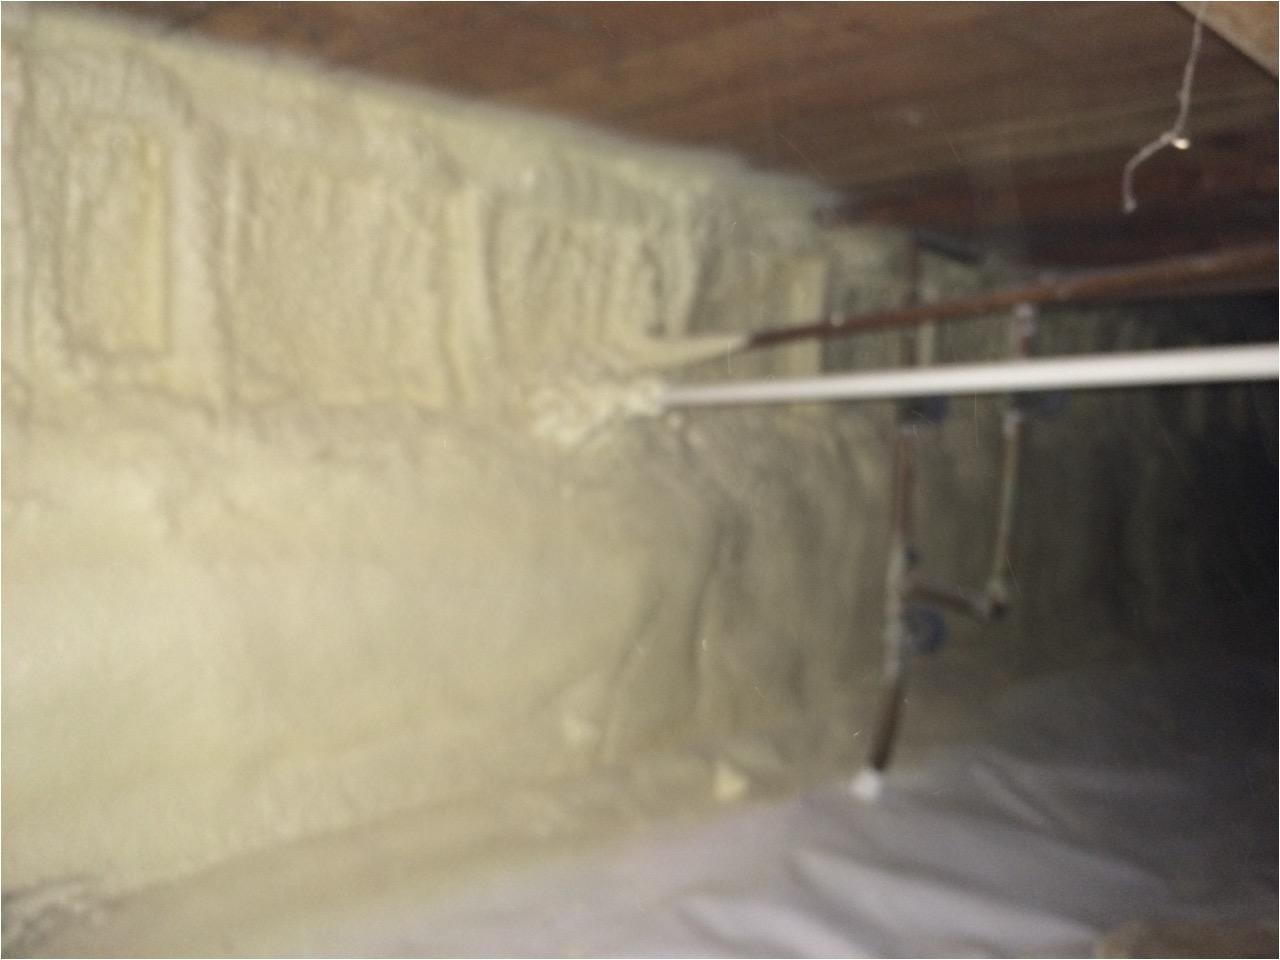 6958 album renovated attic crawl space in portland or